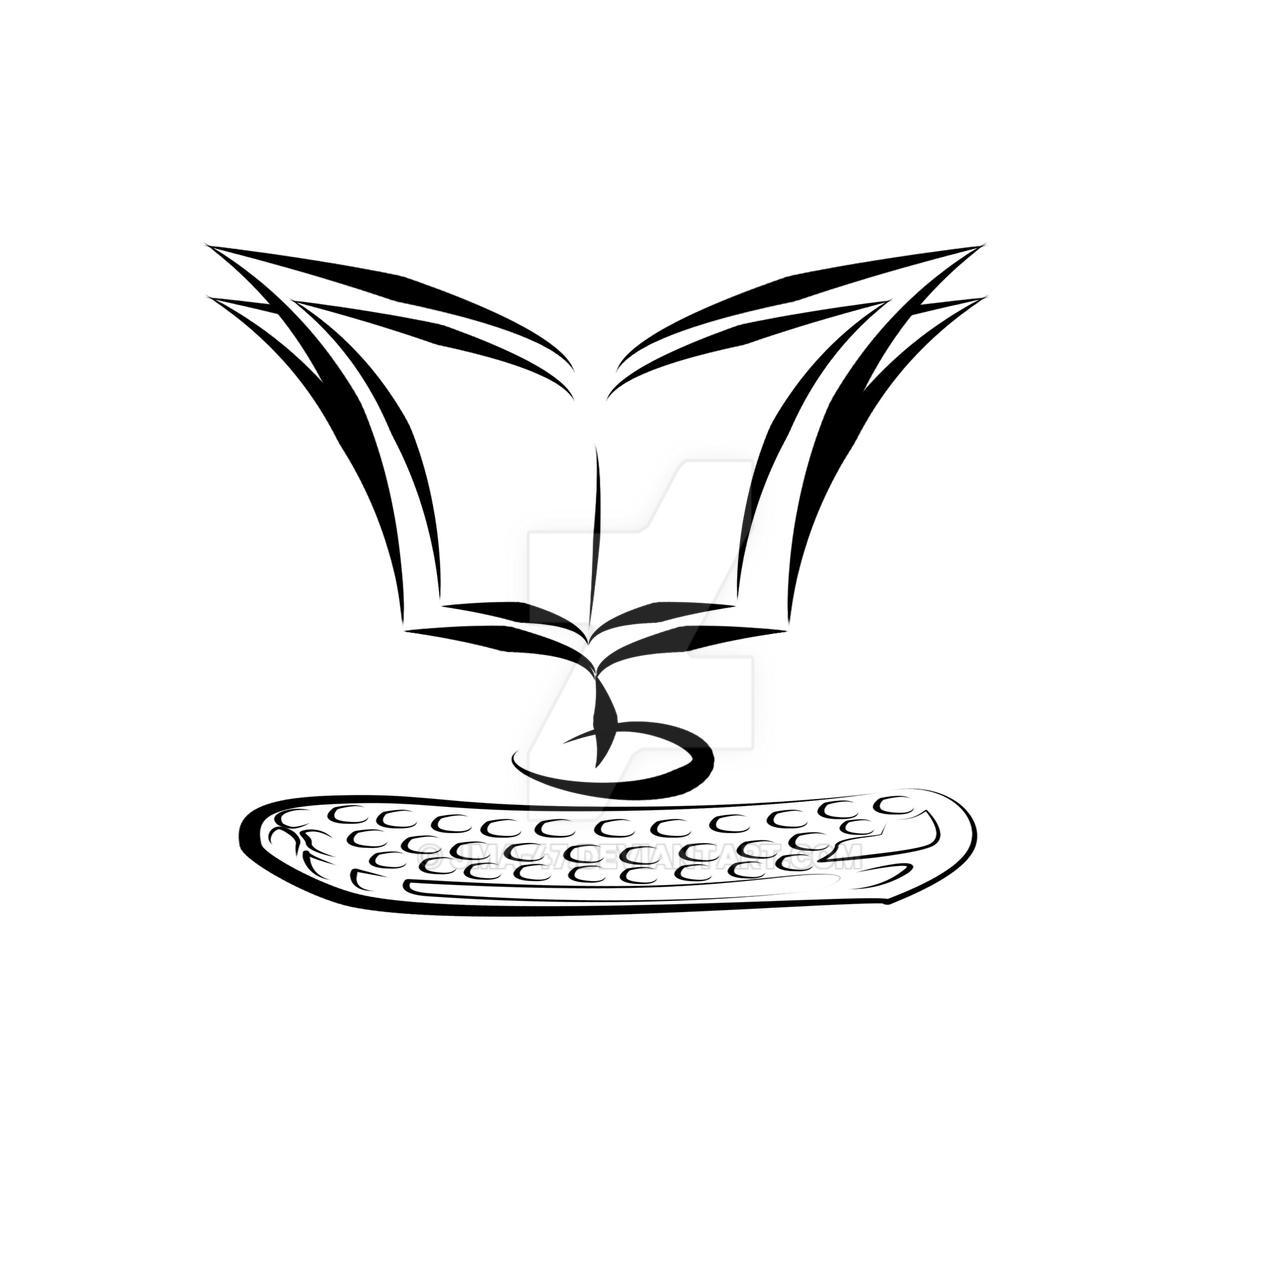 computer education logo 2 by jma 47 on deviantart